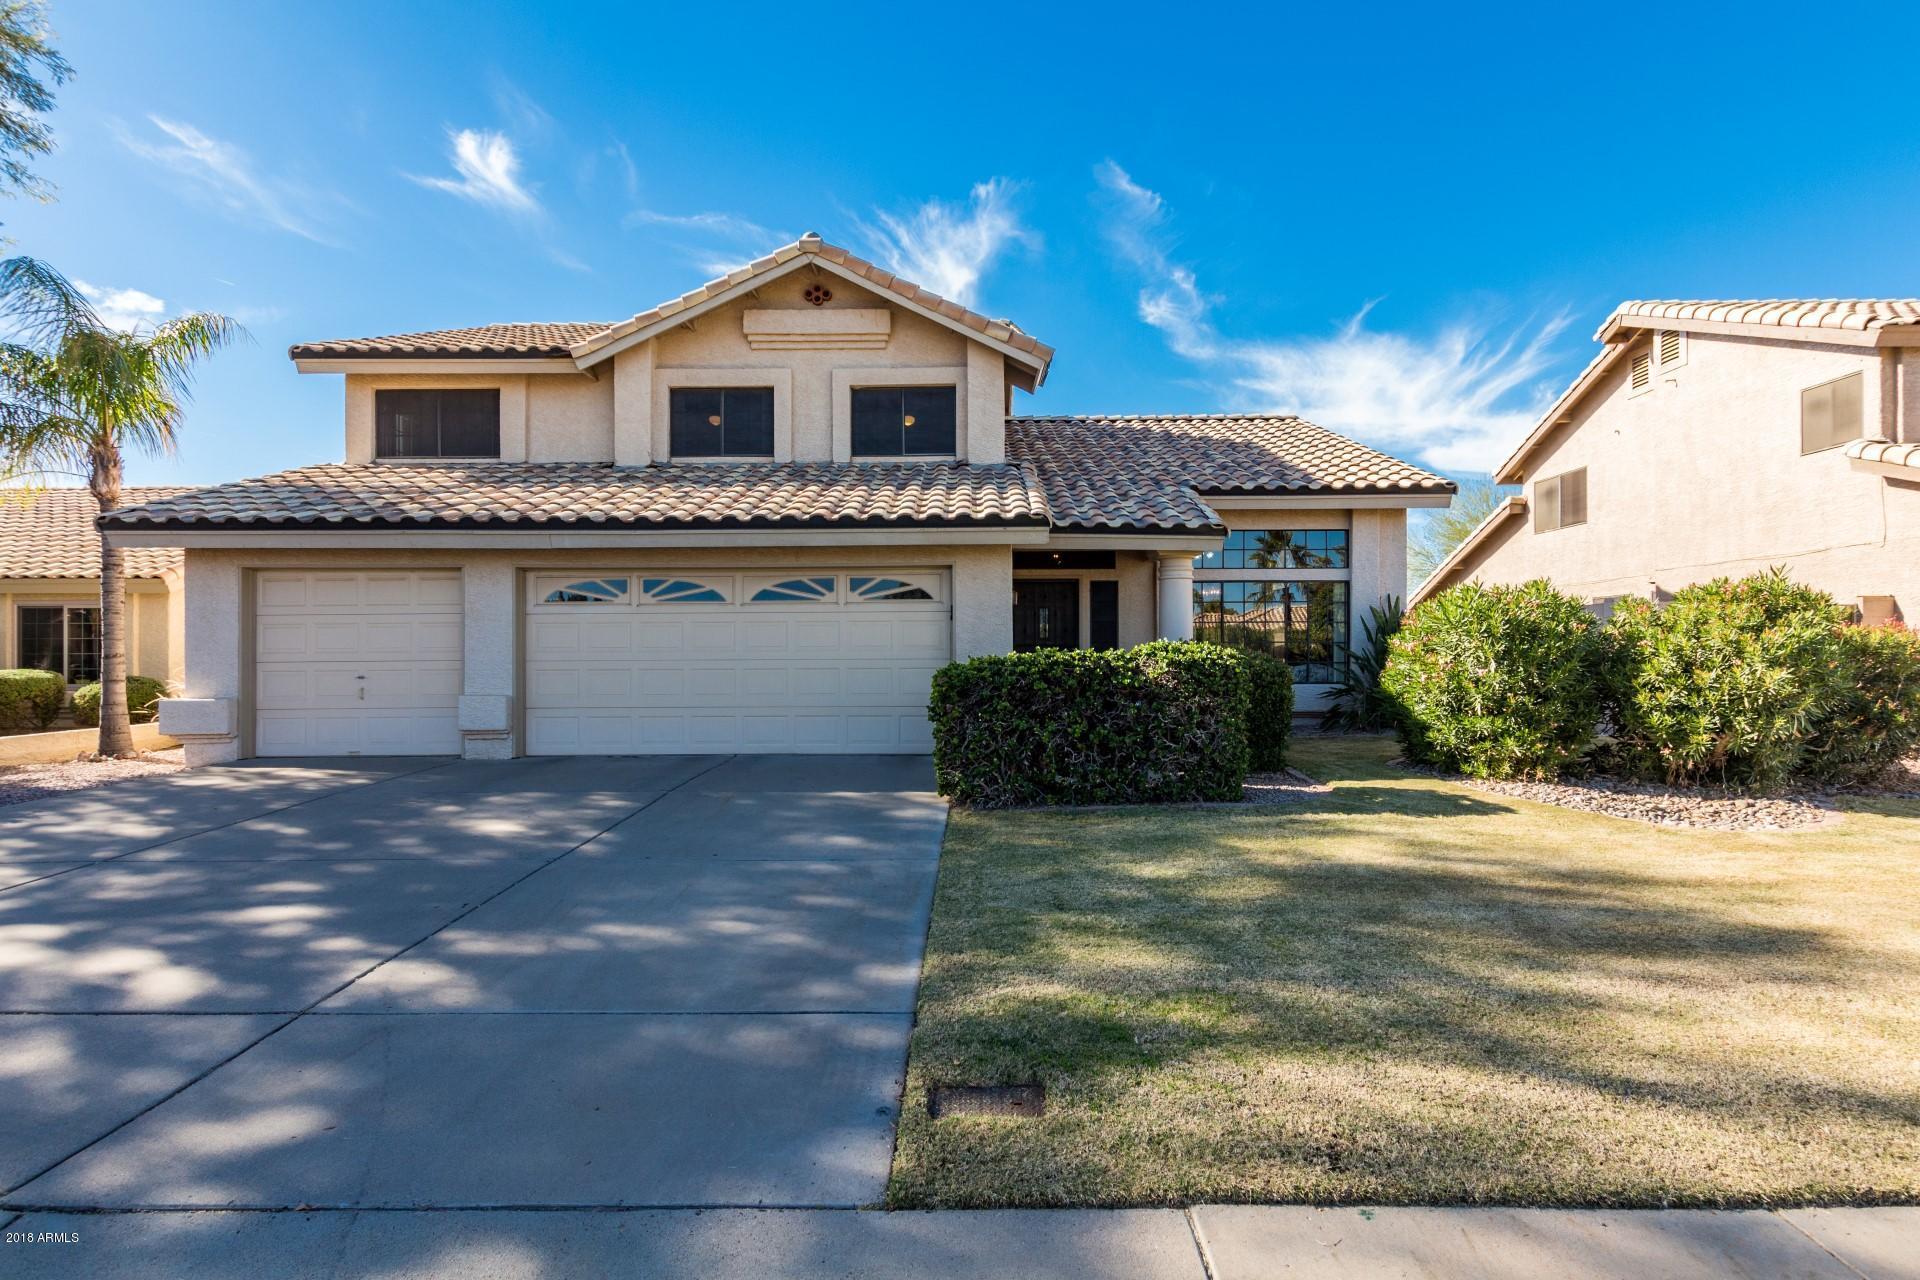 Photo of 1524 N SETON --, Mesa, AZ 85205